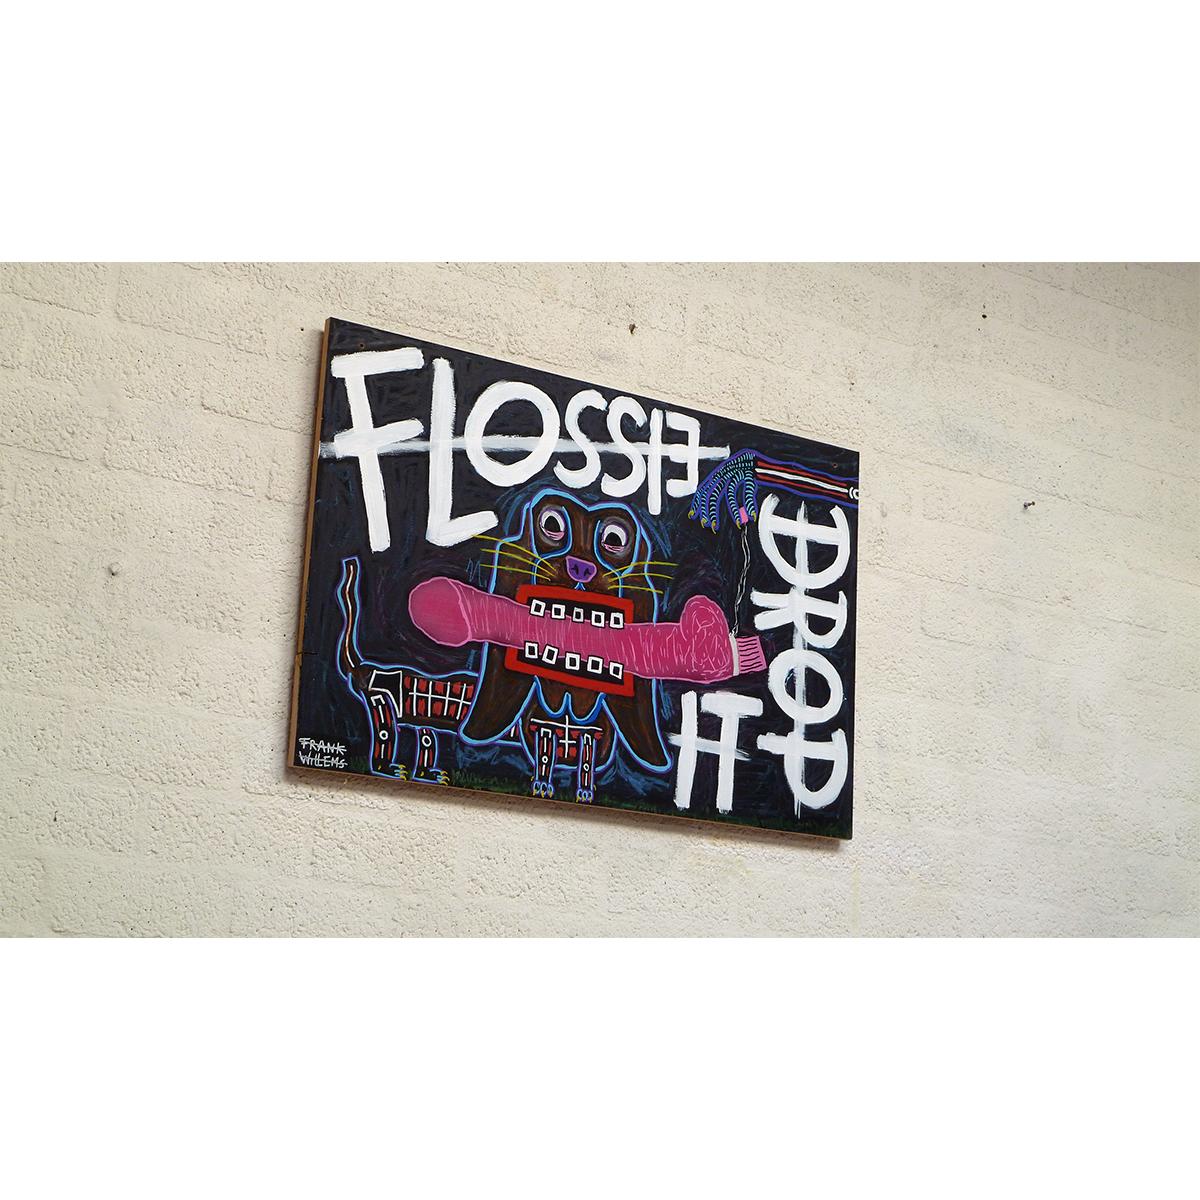 FLOSSIE, DROP IT! 01 - Frank Willems